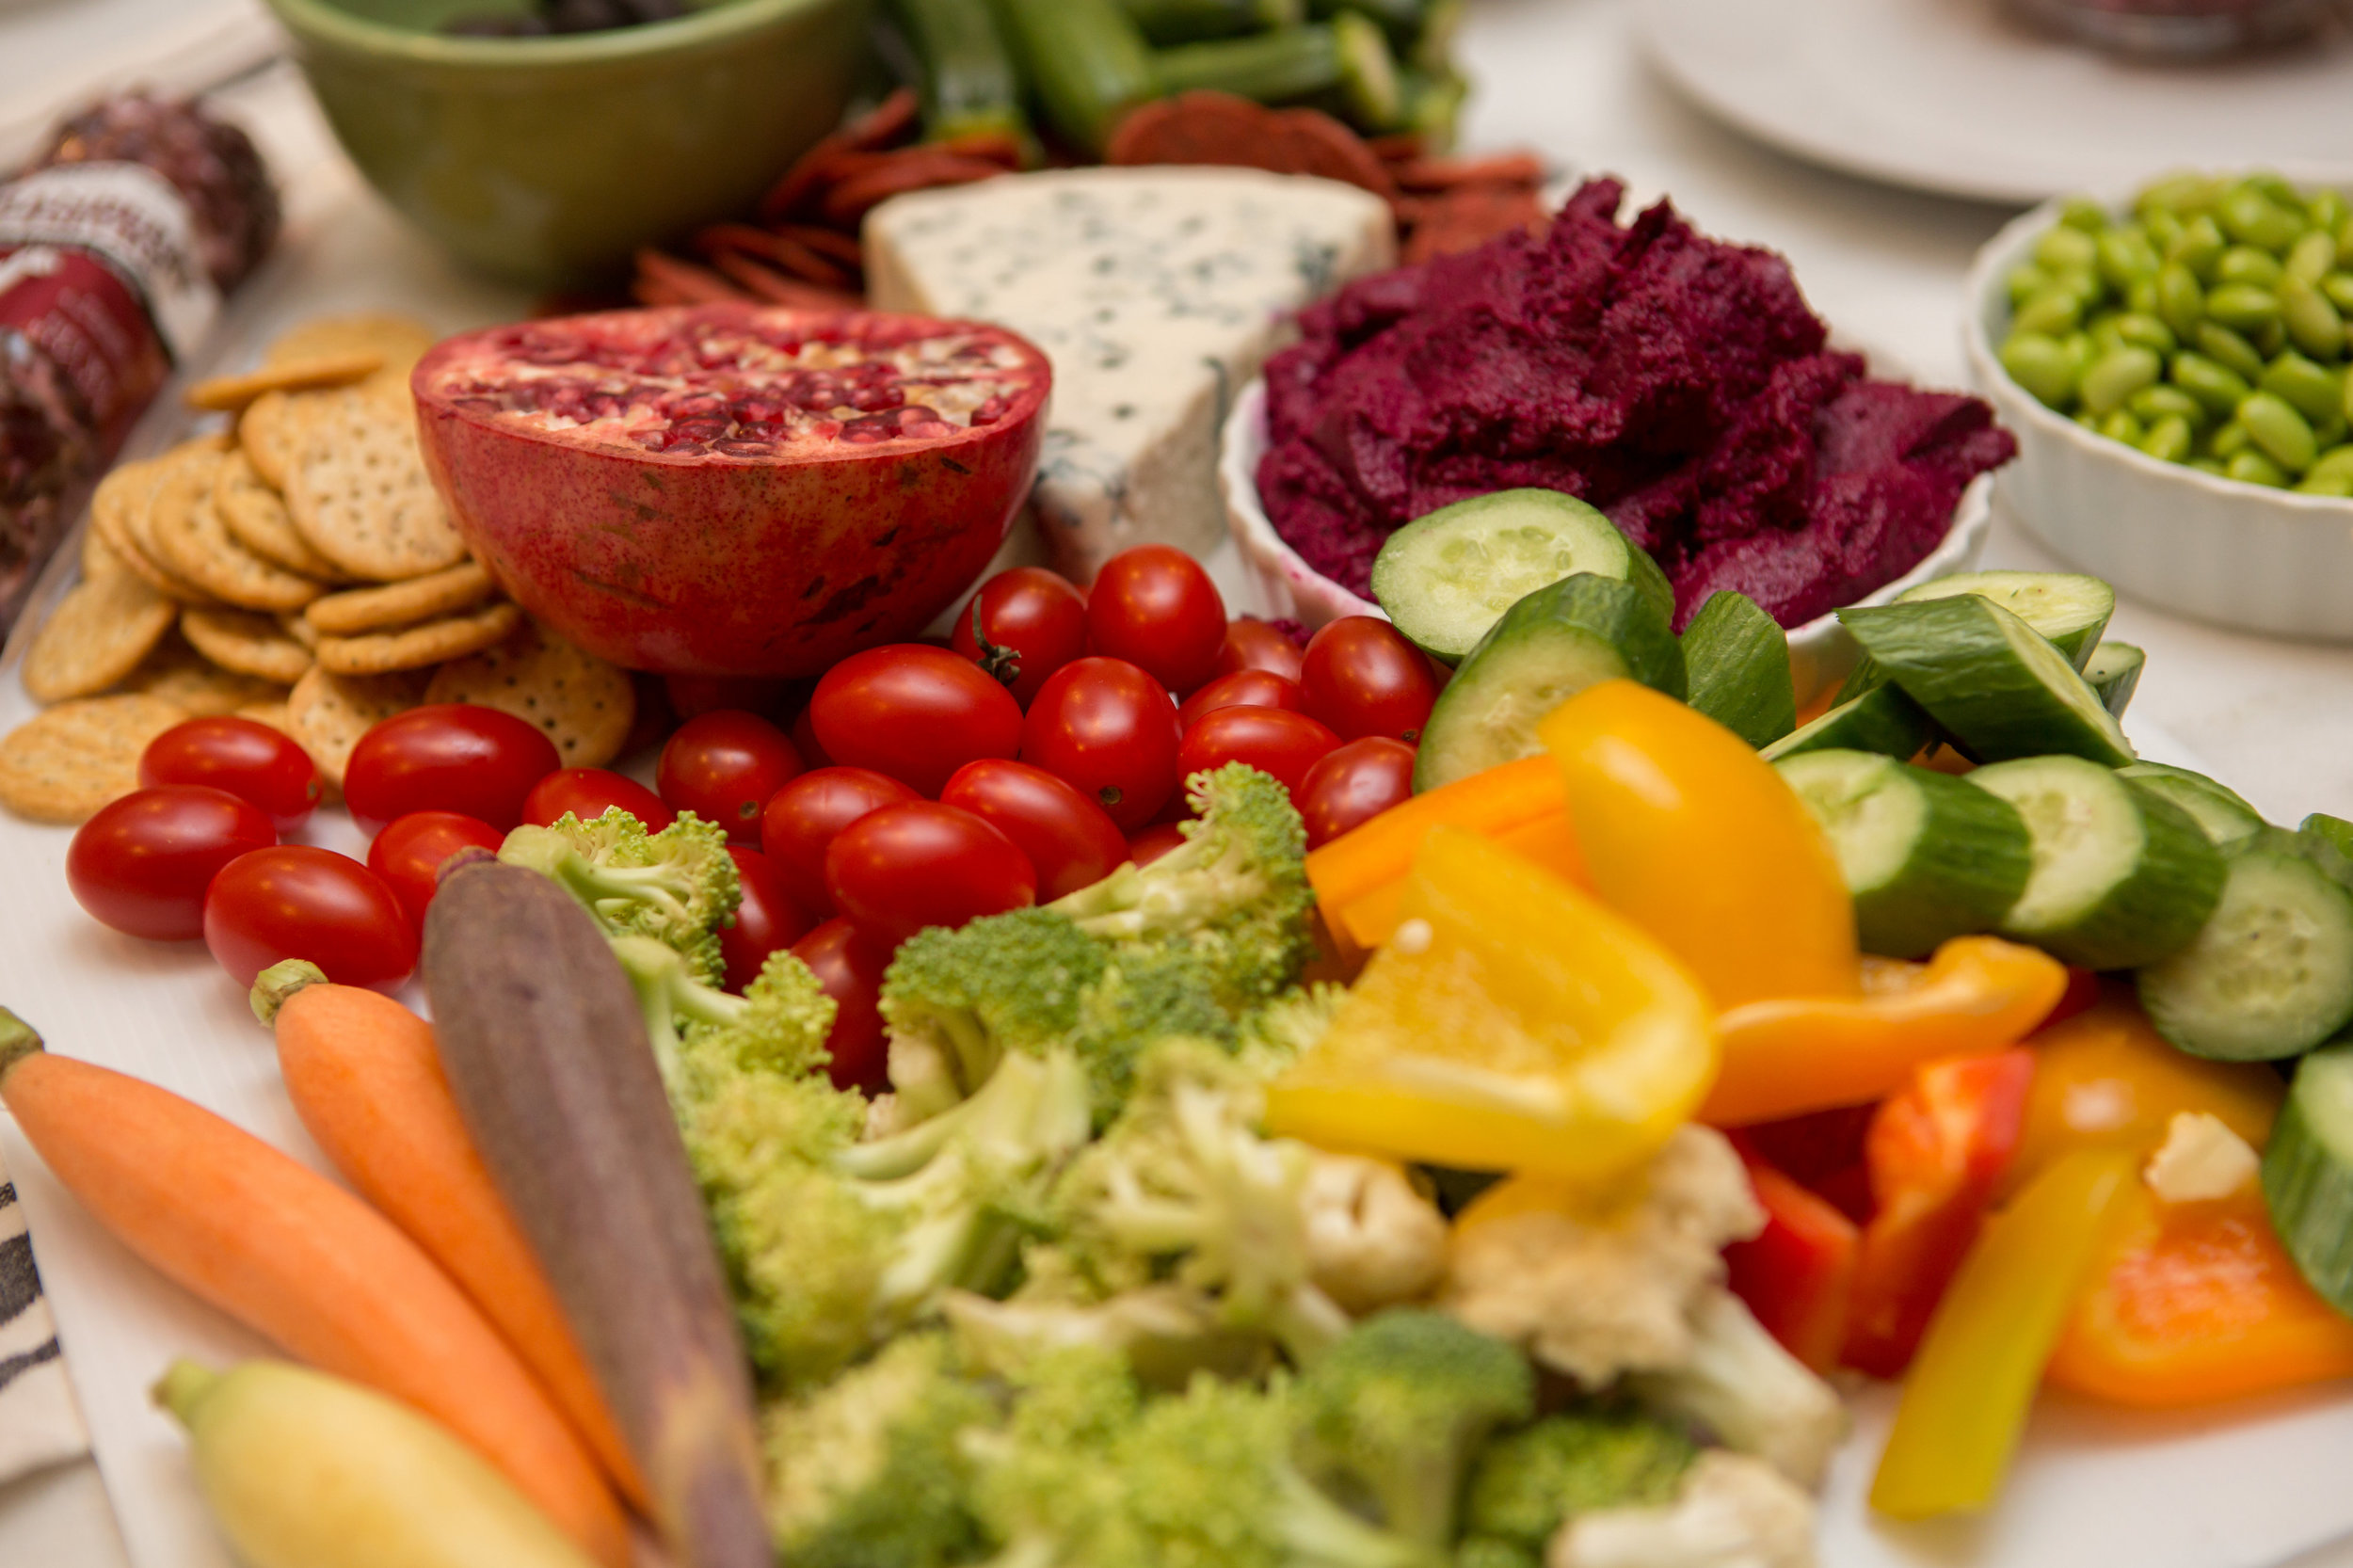 Healthy Holiday Party-Healthy Holiday Party-0013.jpg